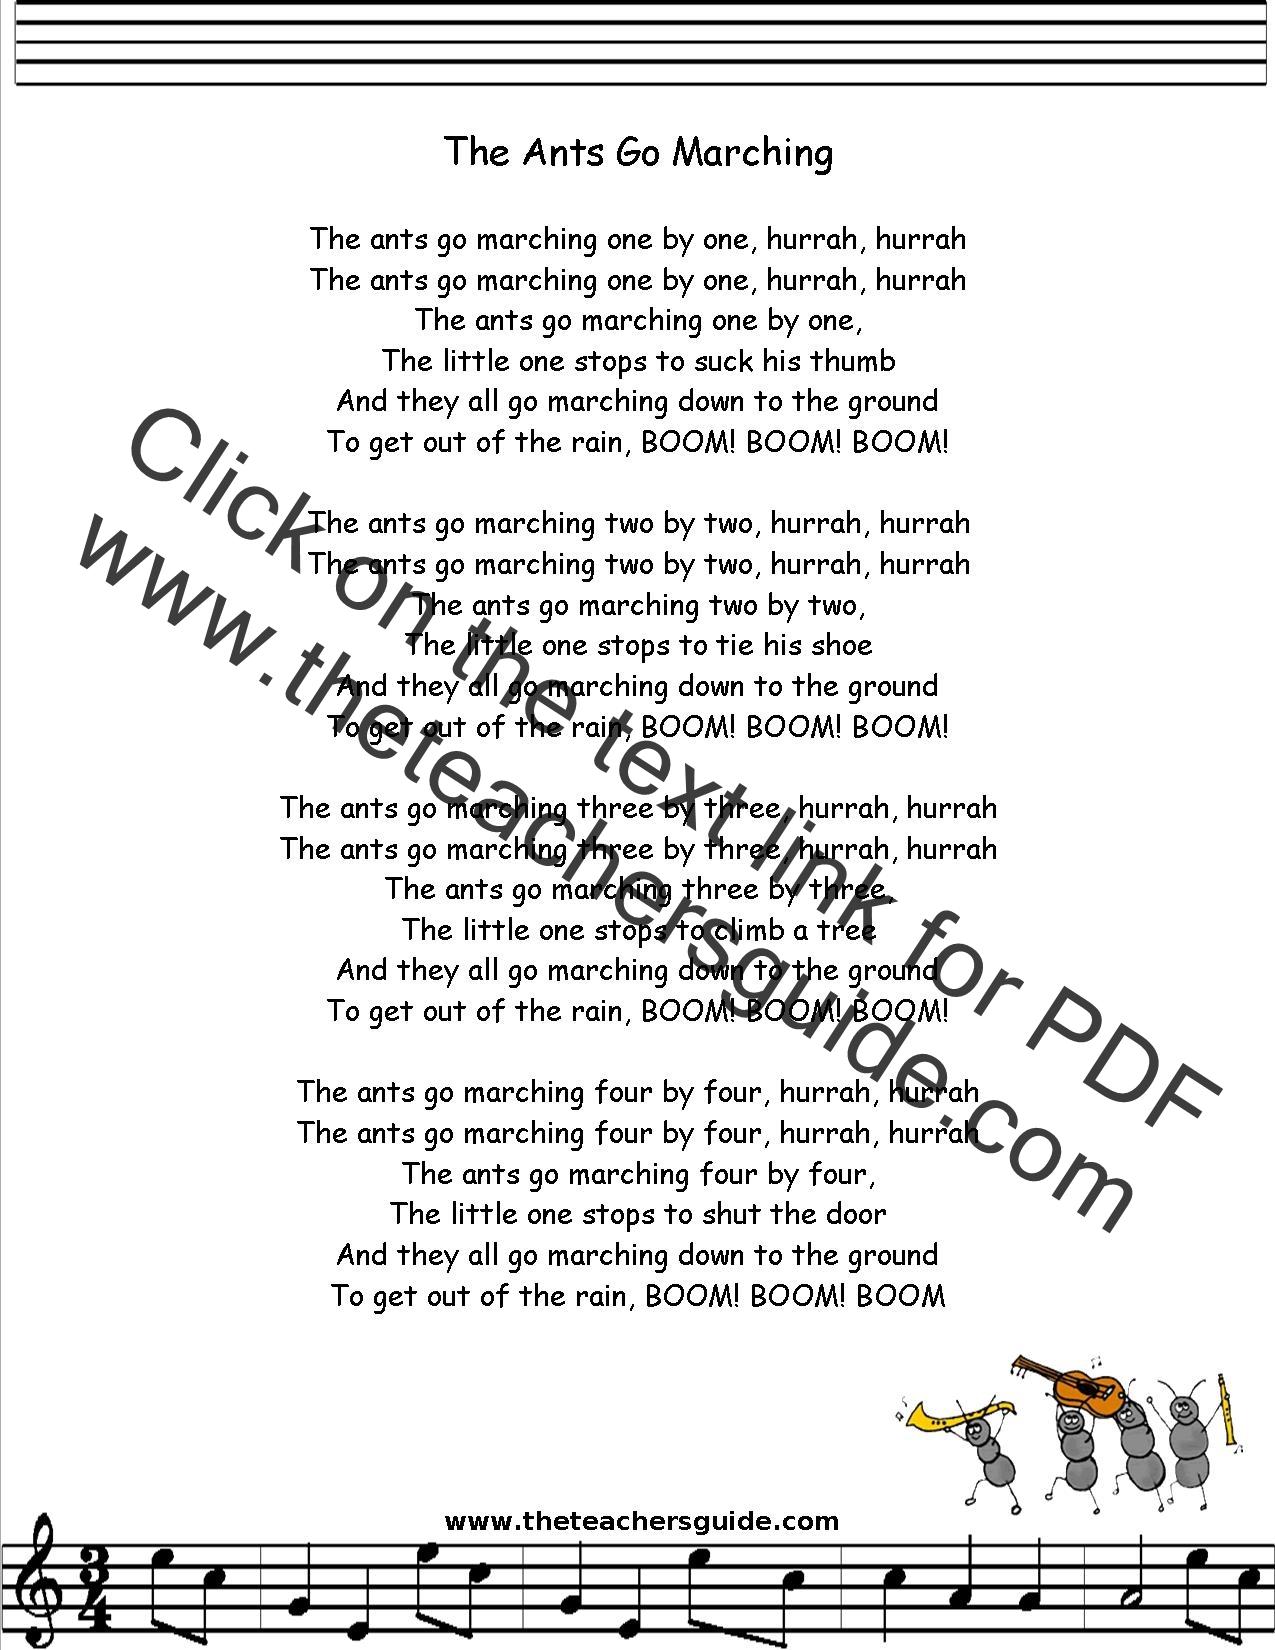 The Ants Go Marching Lyrics Printout Midi And Video